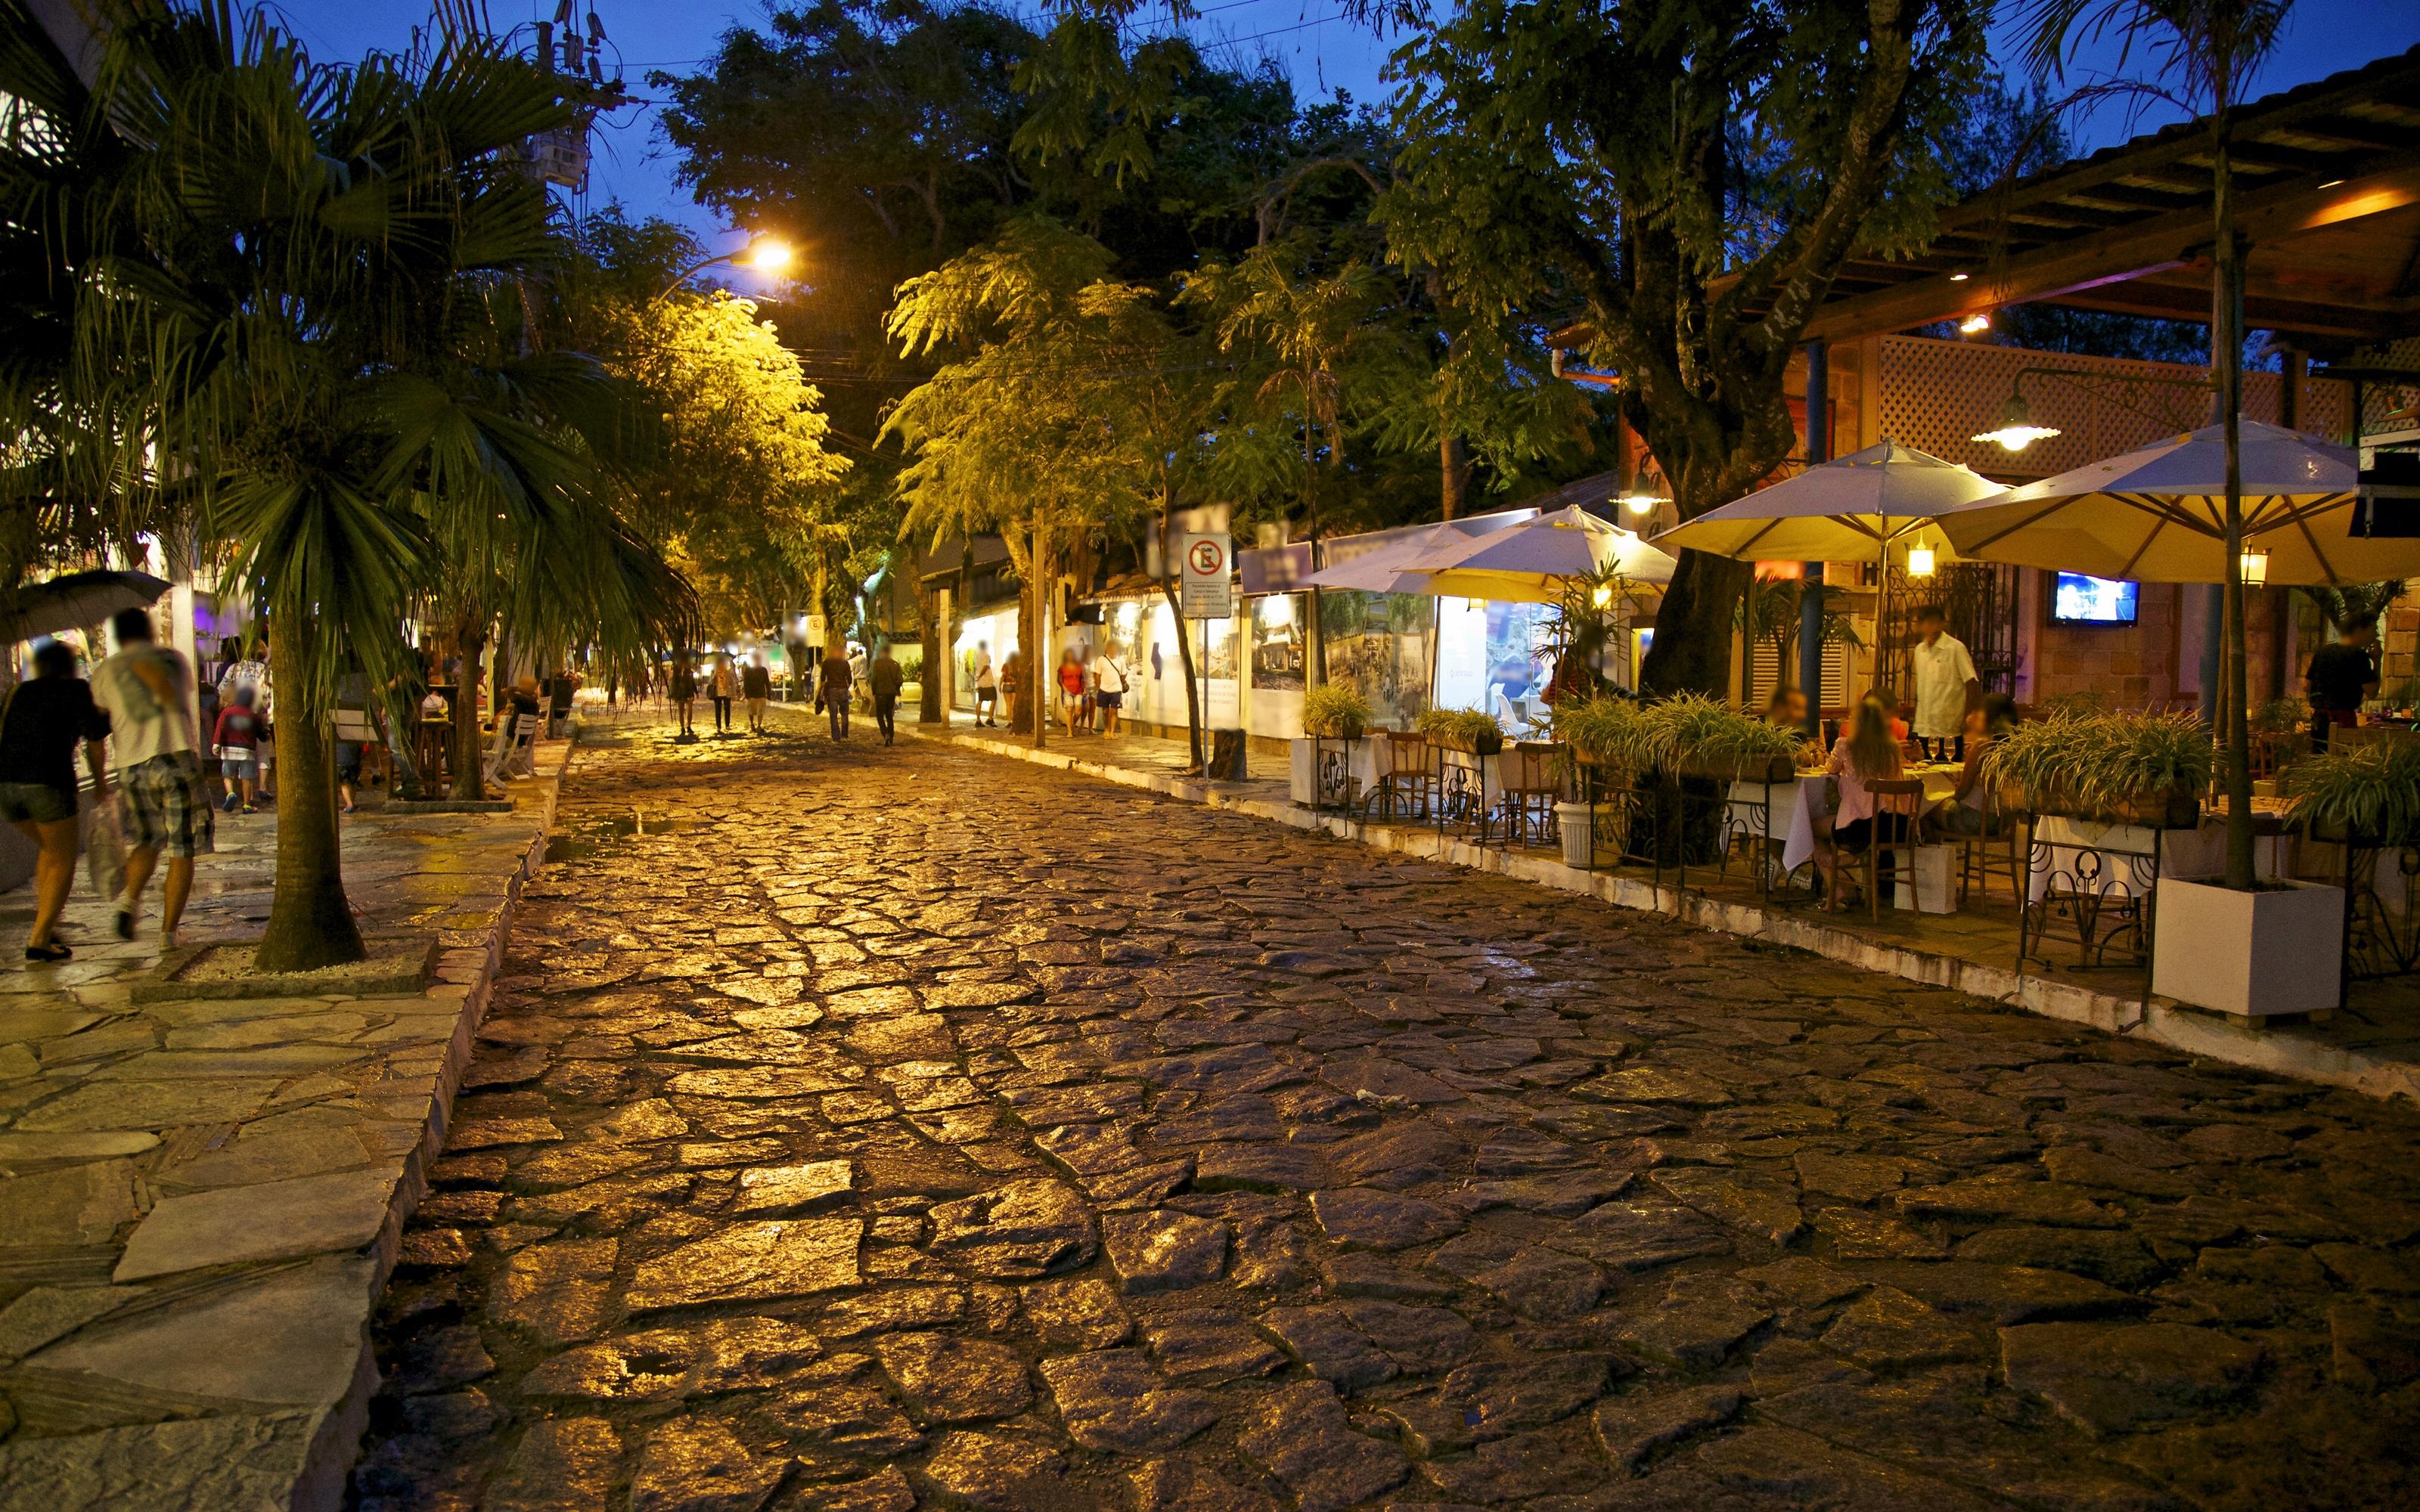 426877_buzios_brazil_rua-das-pedras_street_texture_3200x2000_www-gdefon-ru_